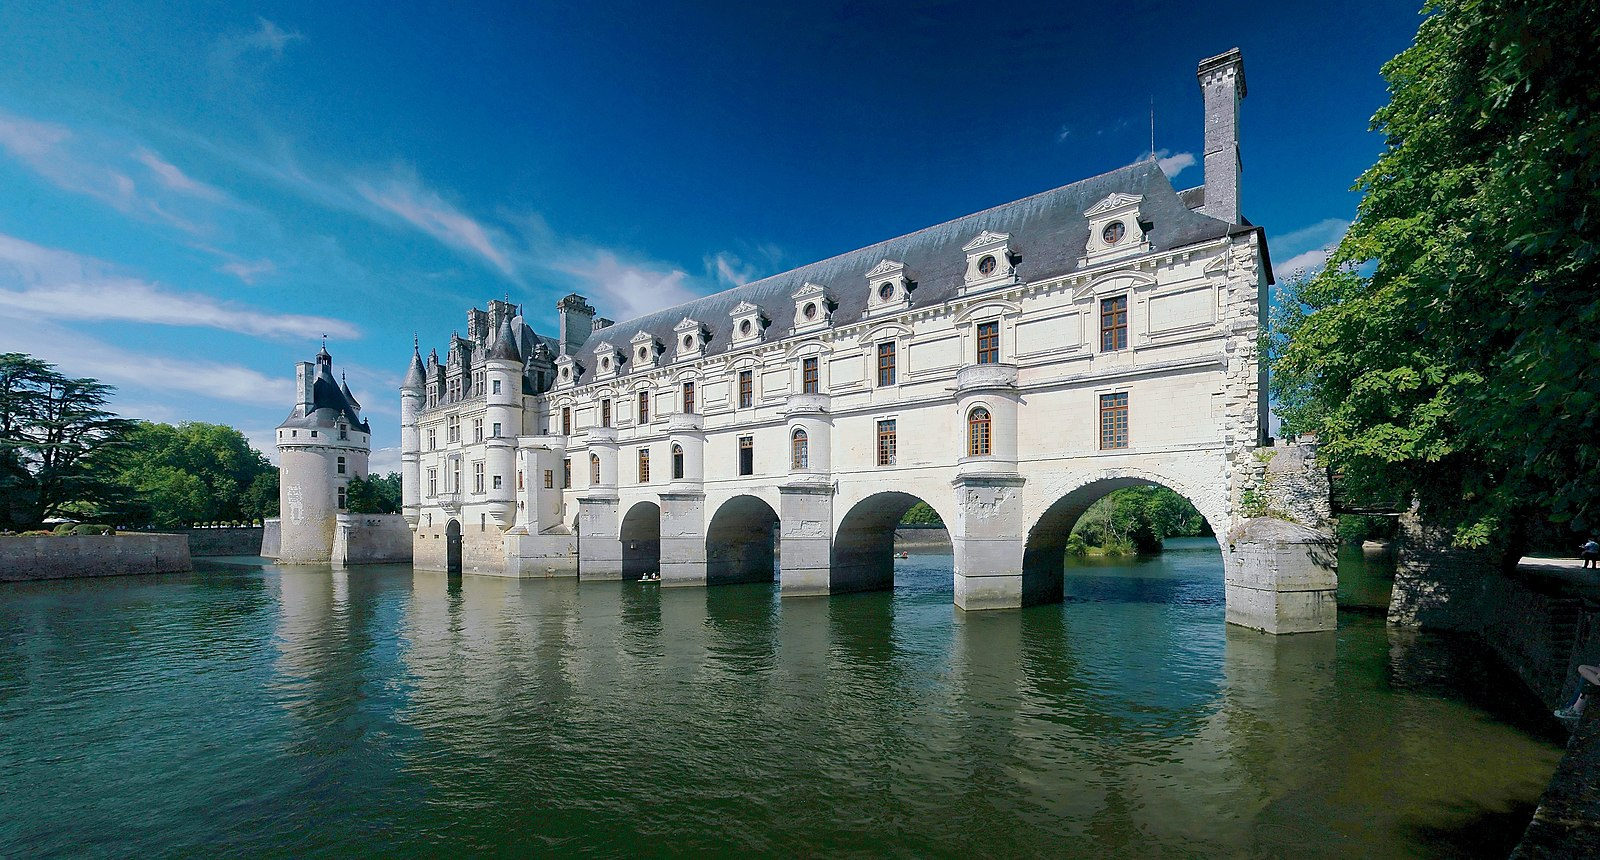 страны архитектура Франция река country architecture France river загрузить